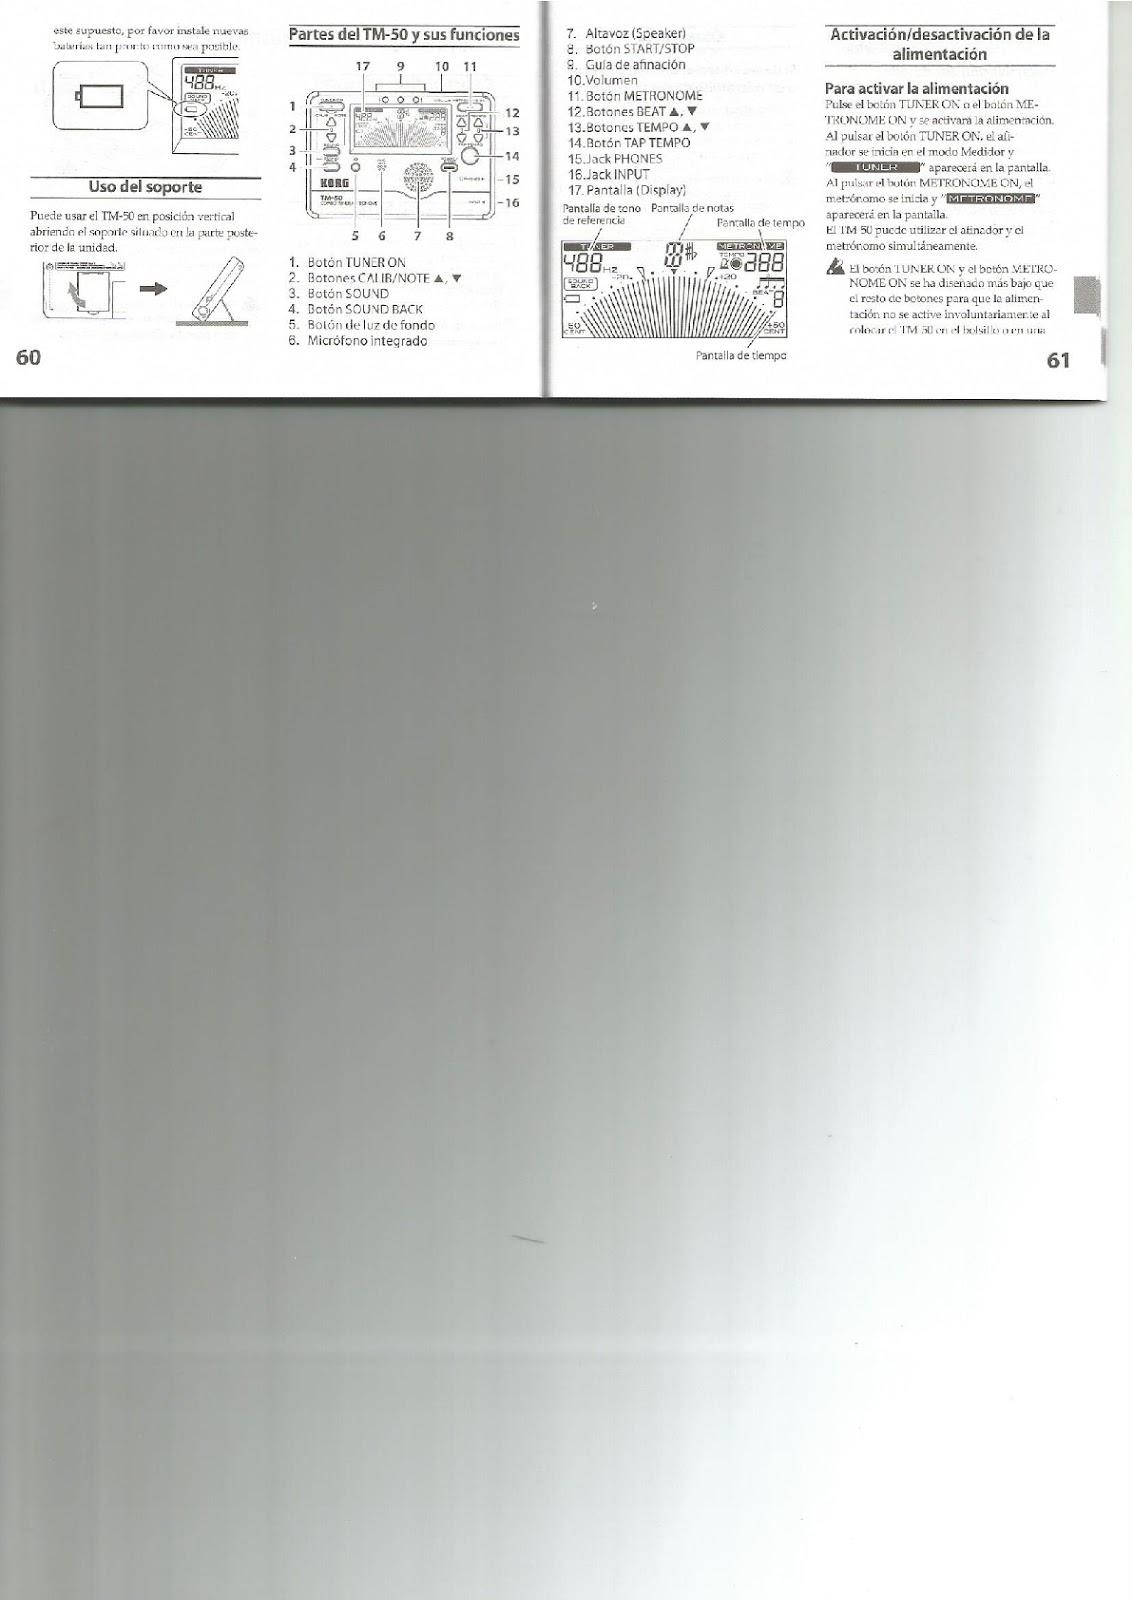 manuaisequiposPDF-021.jpg